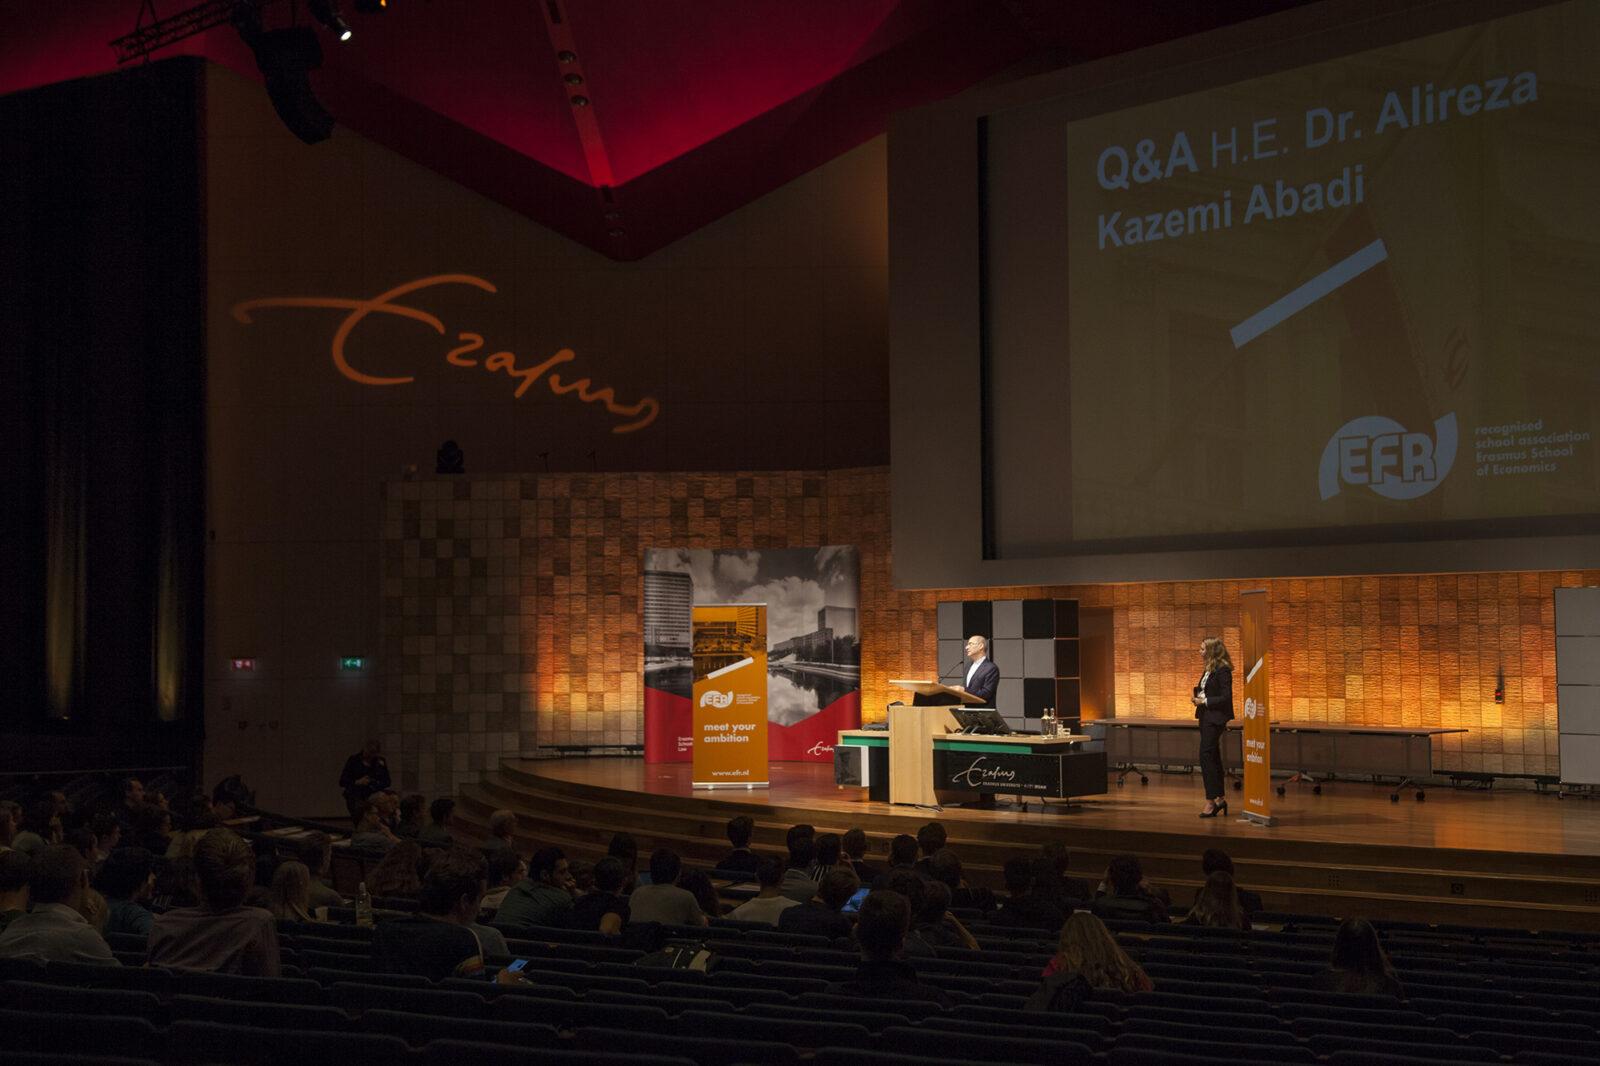 iran ambassadeur kazem abadi irandeal Internationale Economie aula foto Amber Leijen (8)